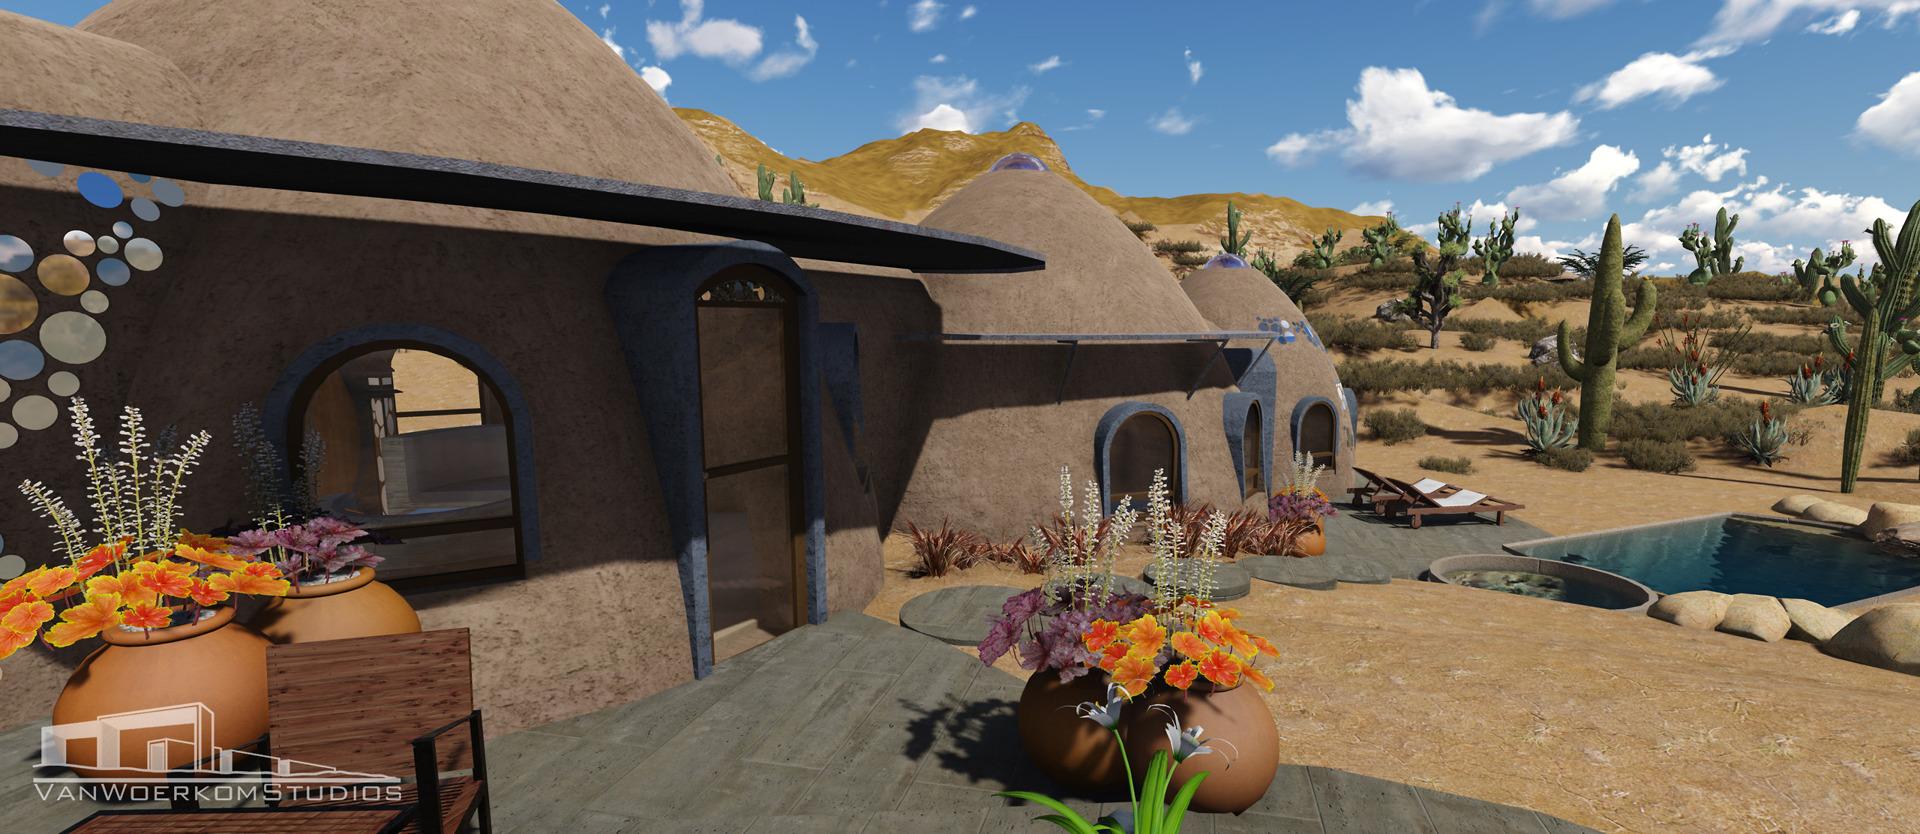 super adobe - jessica van woerkom - MAIN on earthship home designs, stucco home designs, straw bale home designs, earthbag home designs, rammed earth home designs, shelter home designs, cob home designs, adobe home designs,